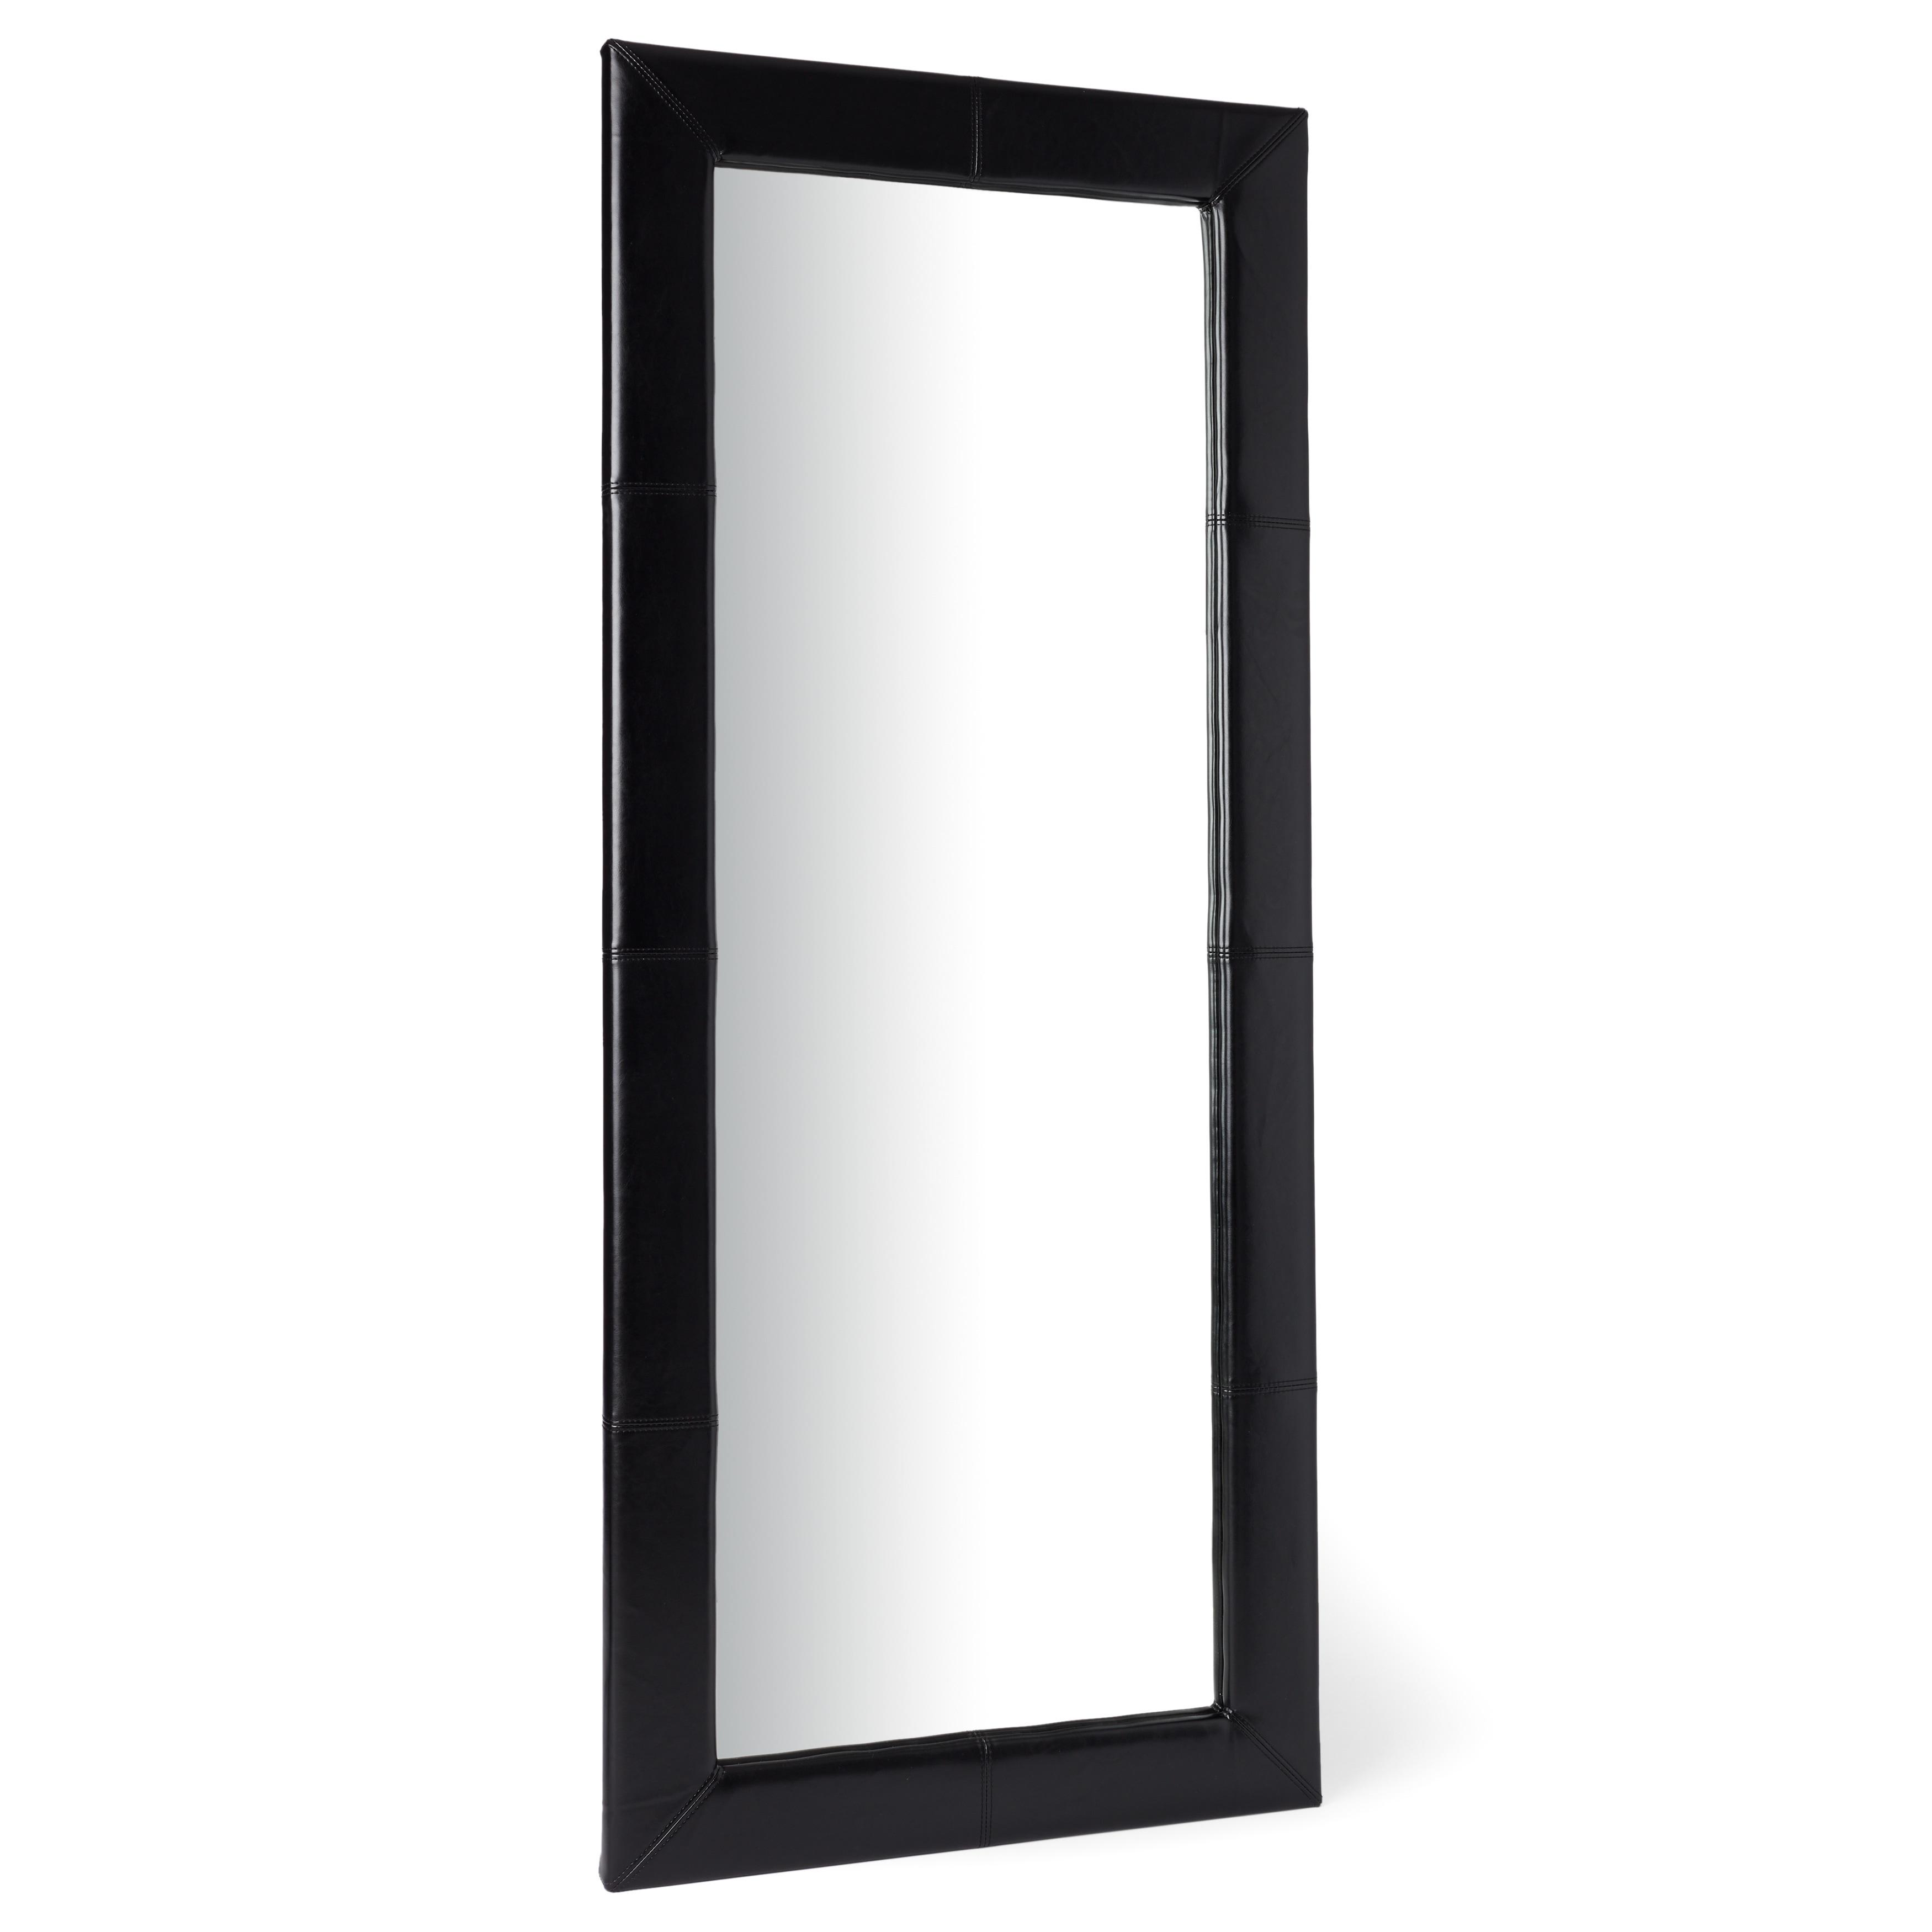 Abbyson Delano Black Leather Floor Mirror - Free Shipping Today ...